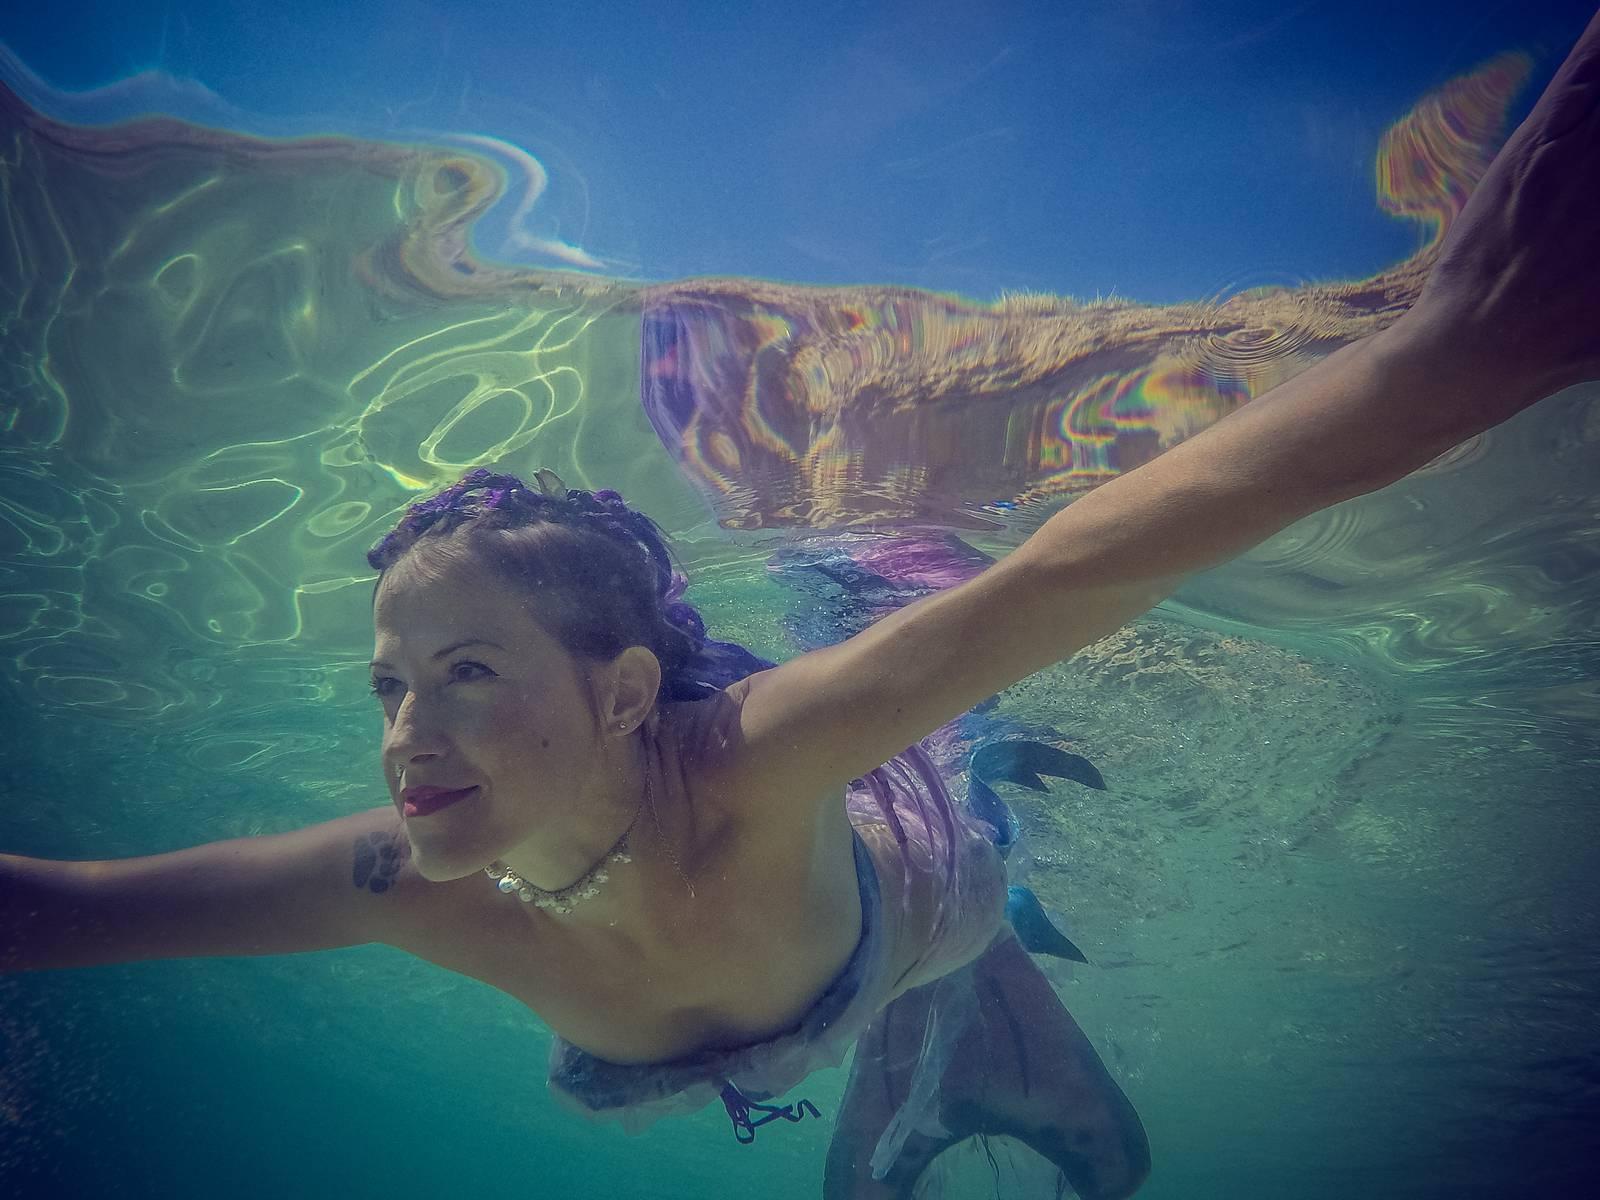 Sunčana je eko sirena: Mornari bi mi pobjegli, tako loše pjevam